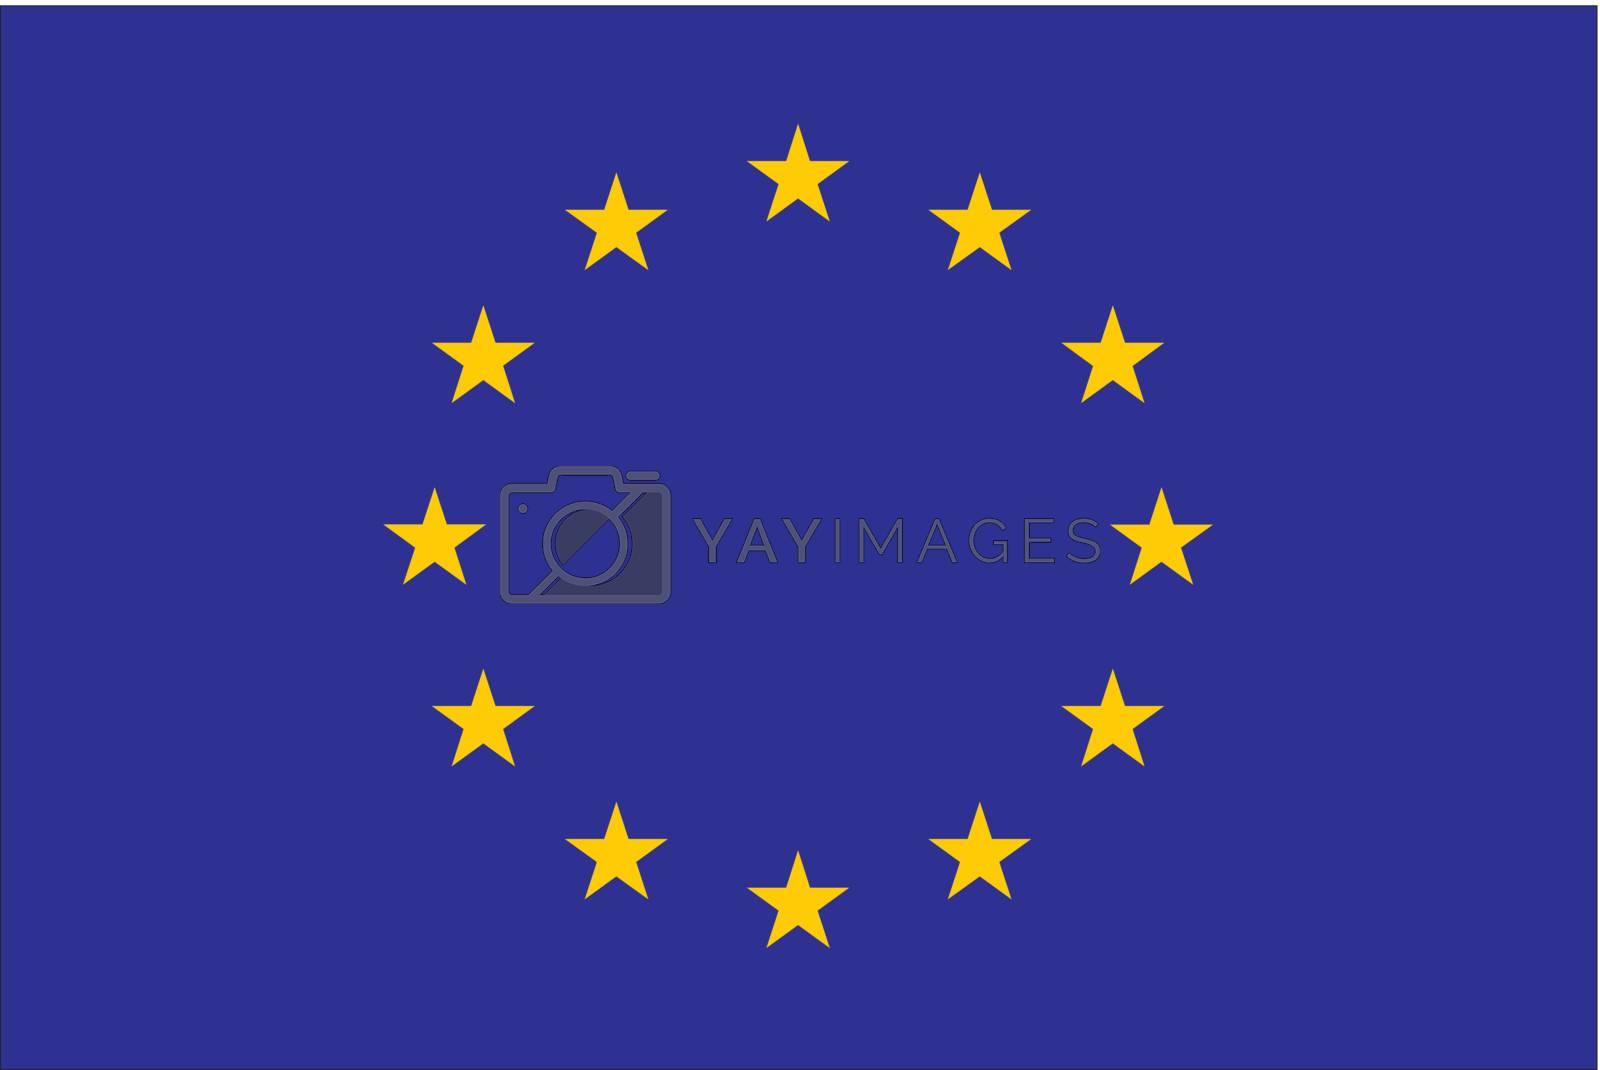 Royalty free image of European Union Flag by ajn